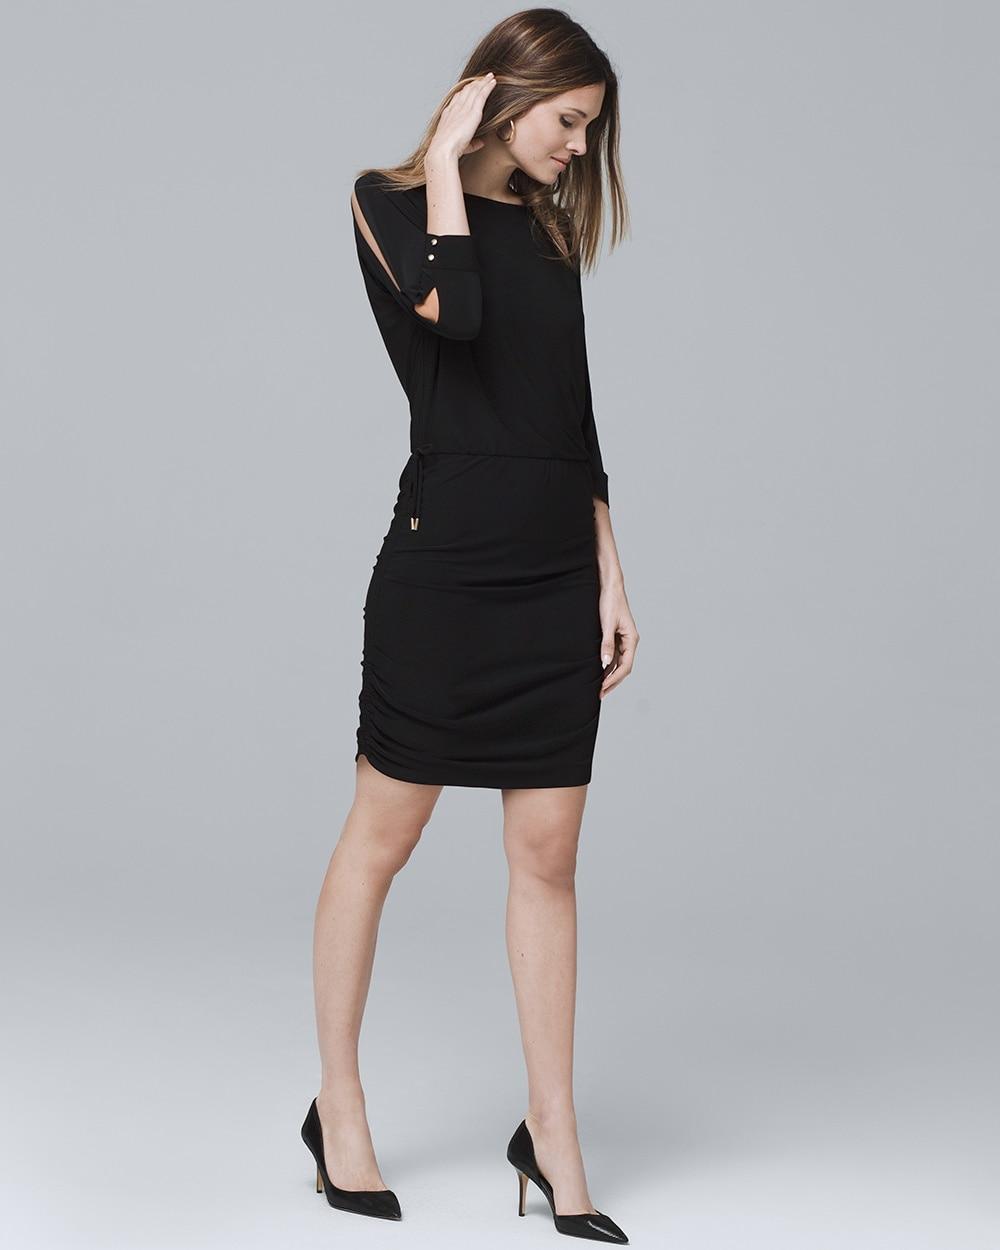 Black Dolman Sleeve Dress